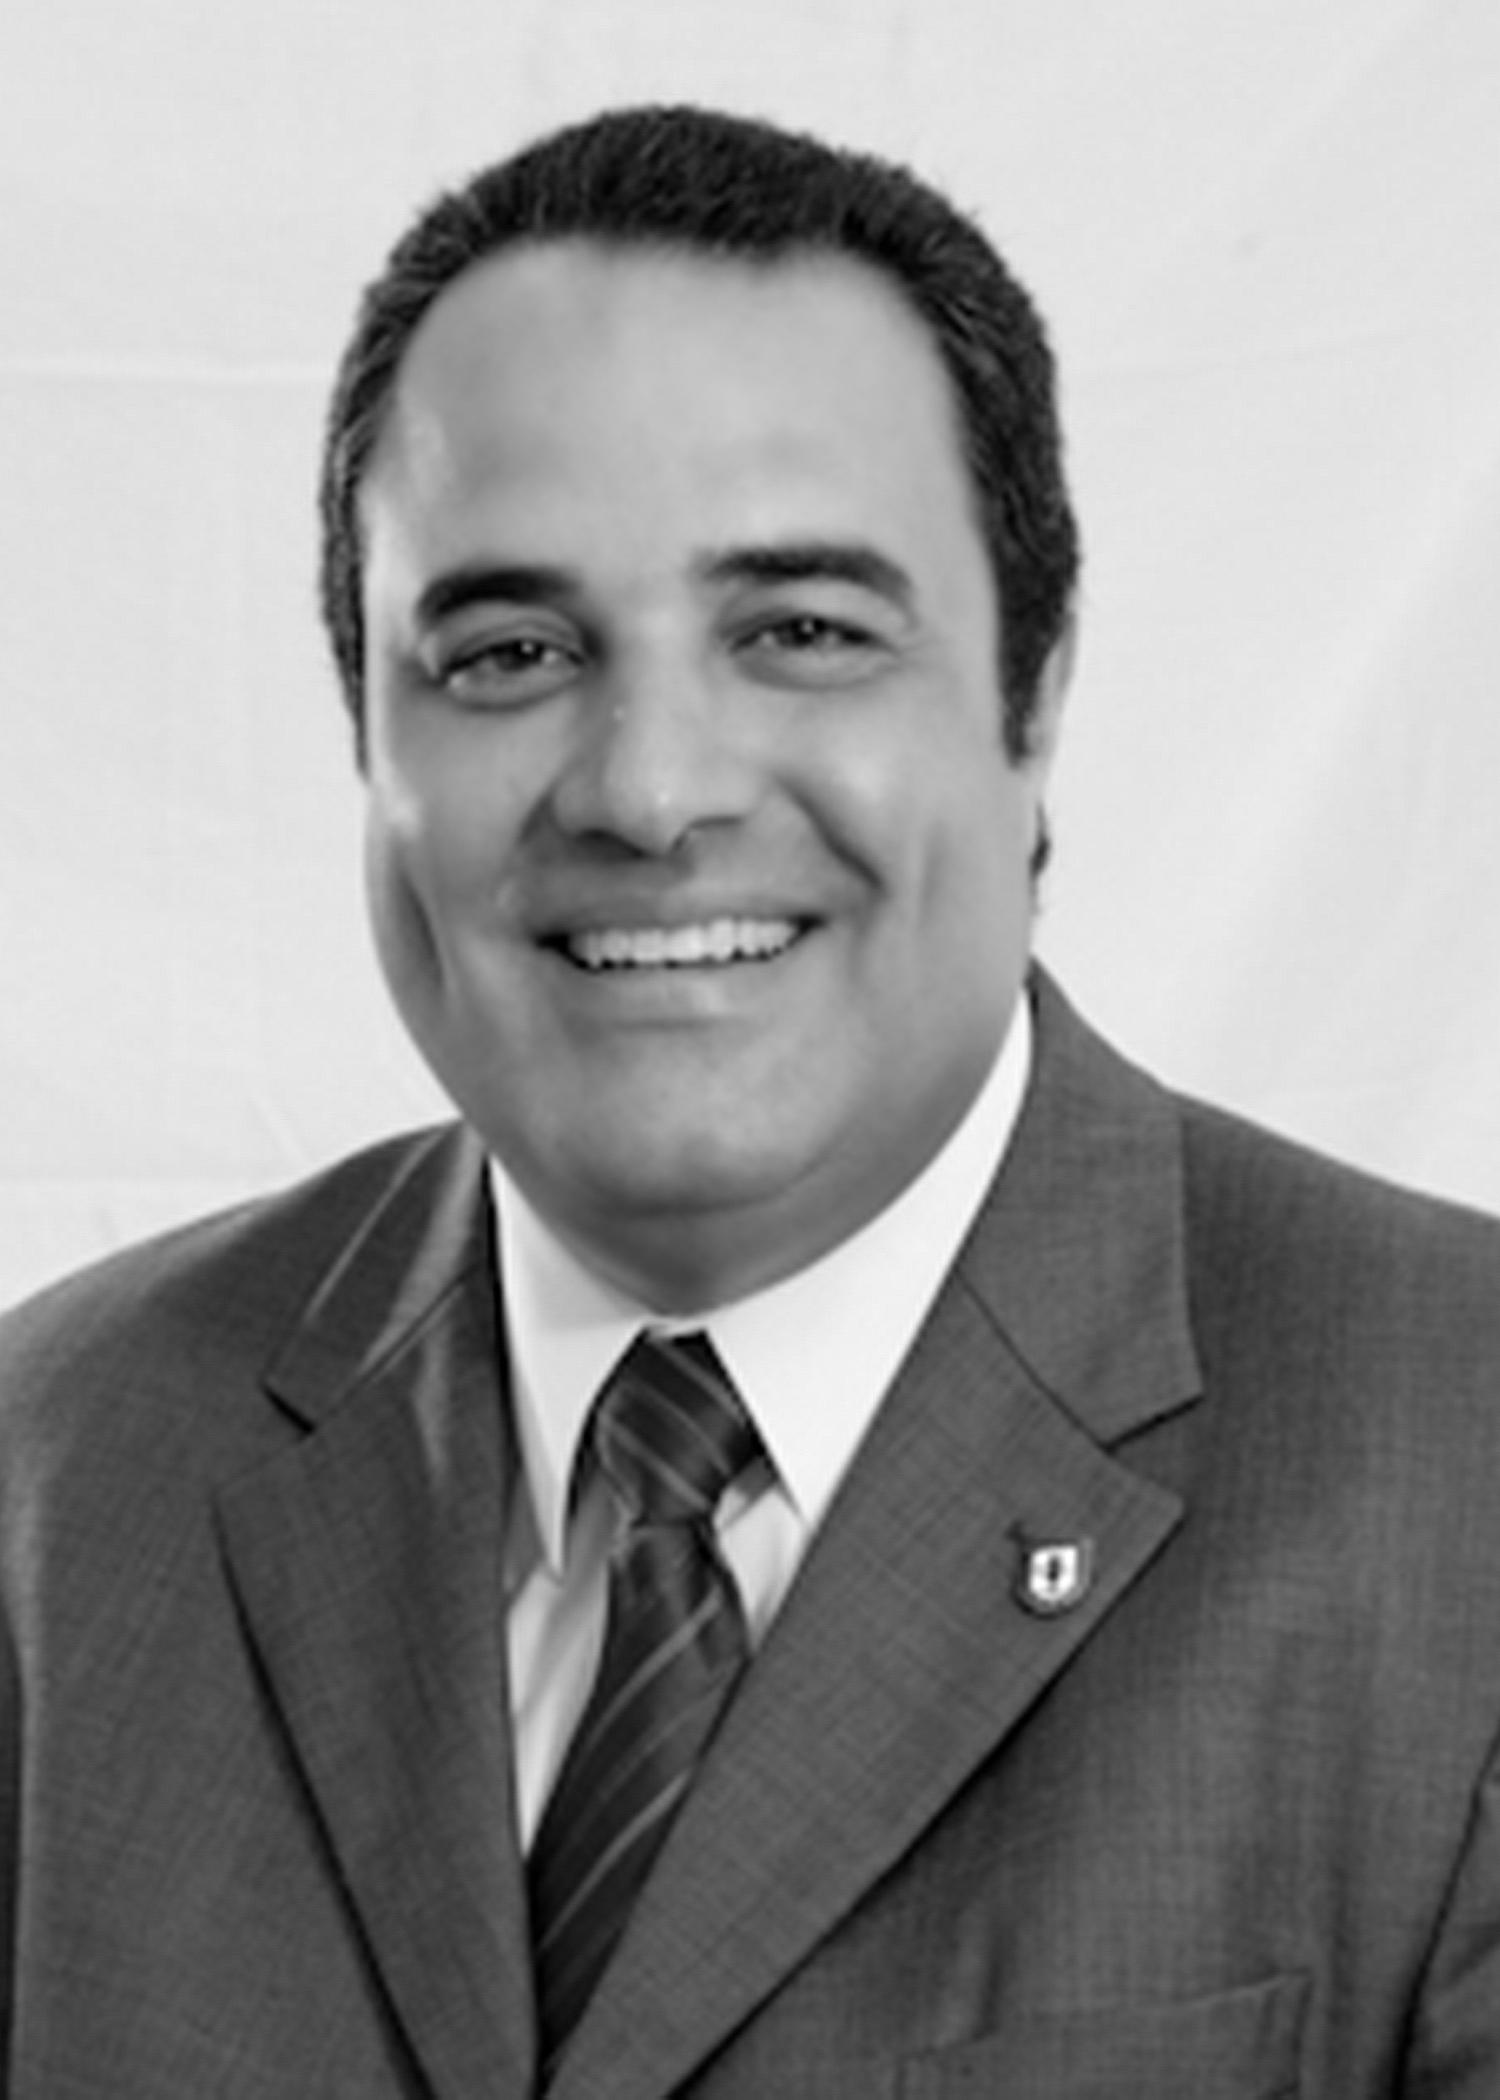 Carlos Gonzalez-Miranda | 2019 Distinguished Alumni Award Winner